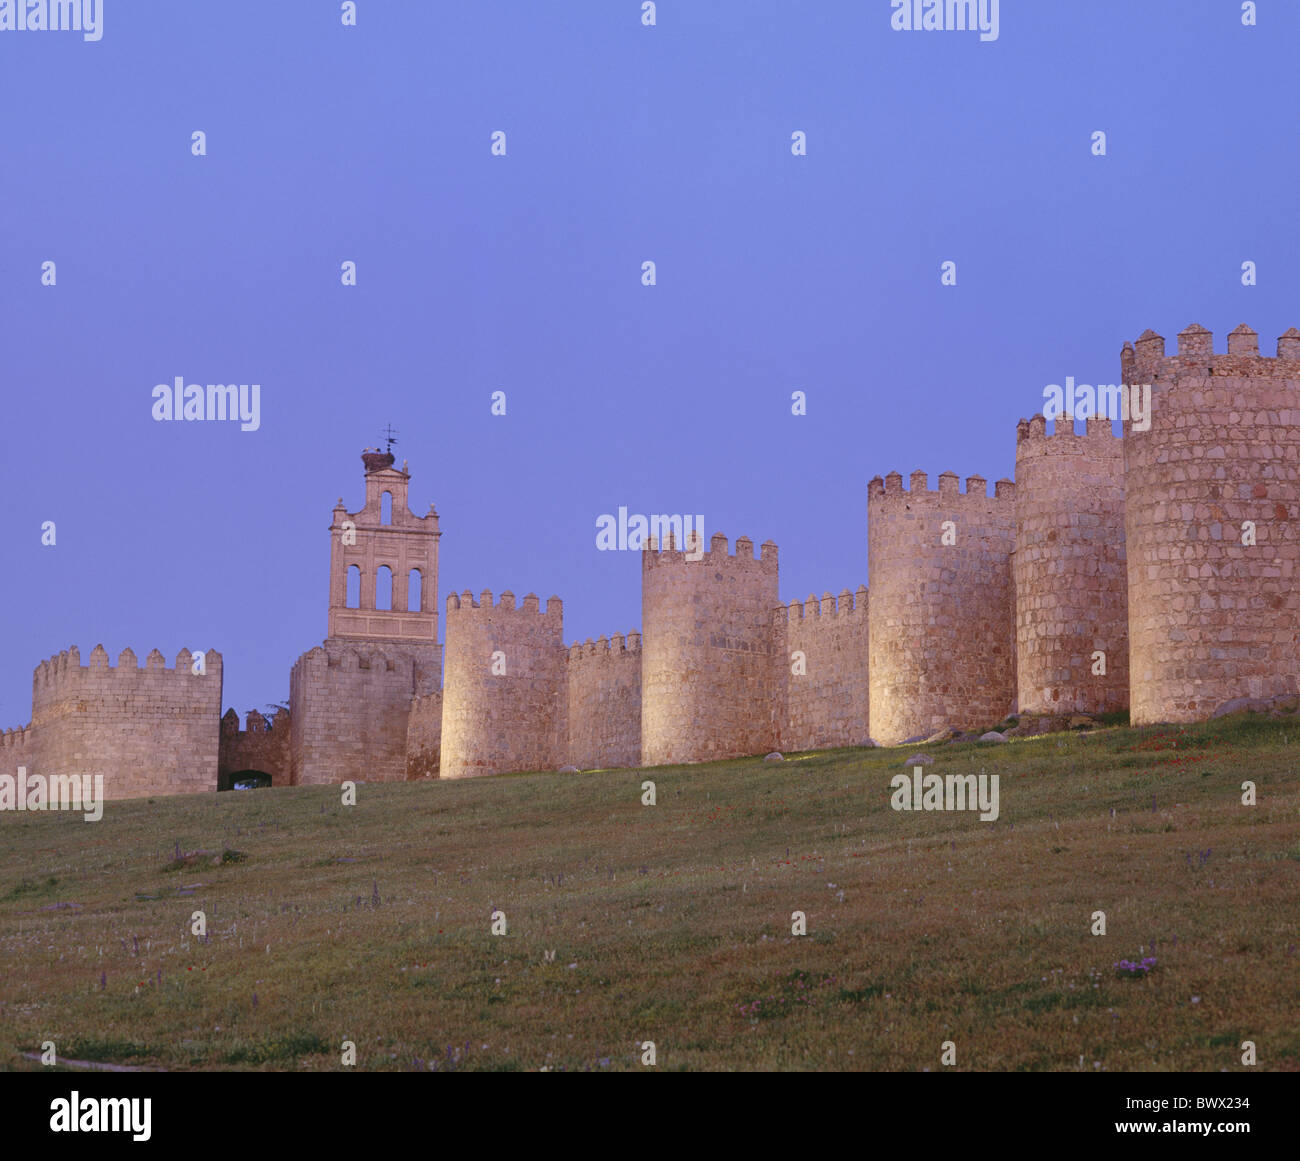 Avila Beleuchtung mittelalterlichen Stadtmauer Spanien Europa Stockbild